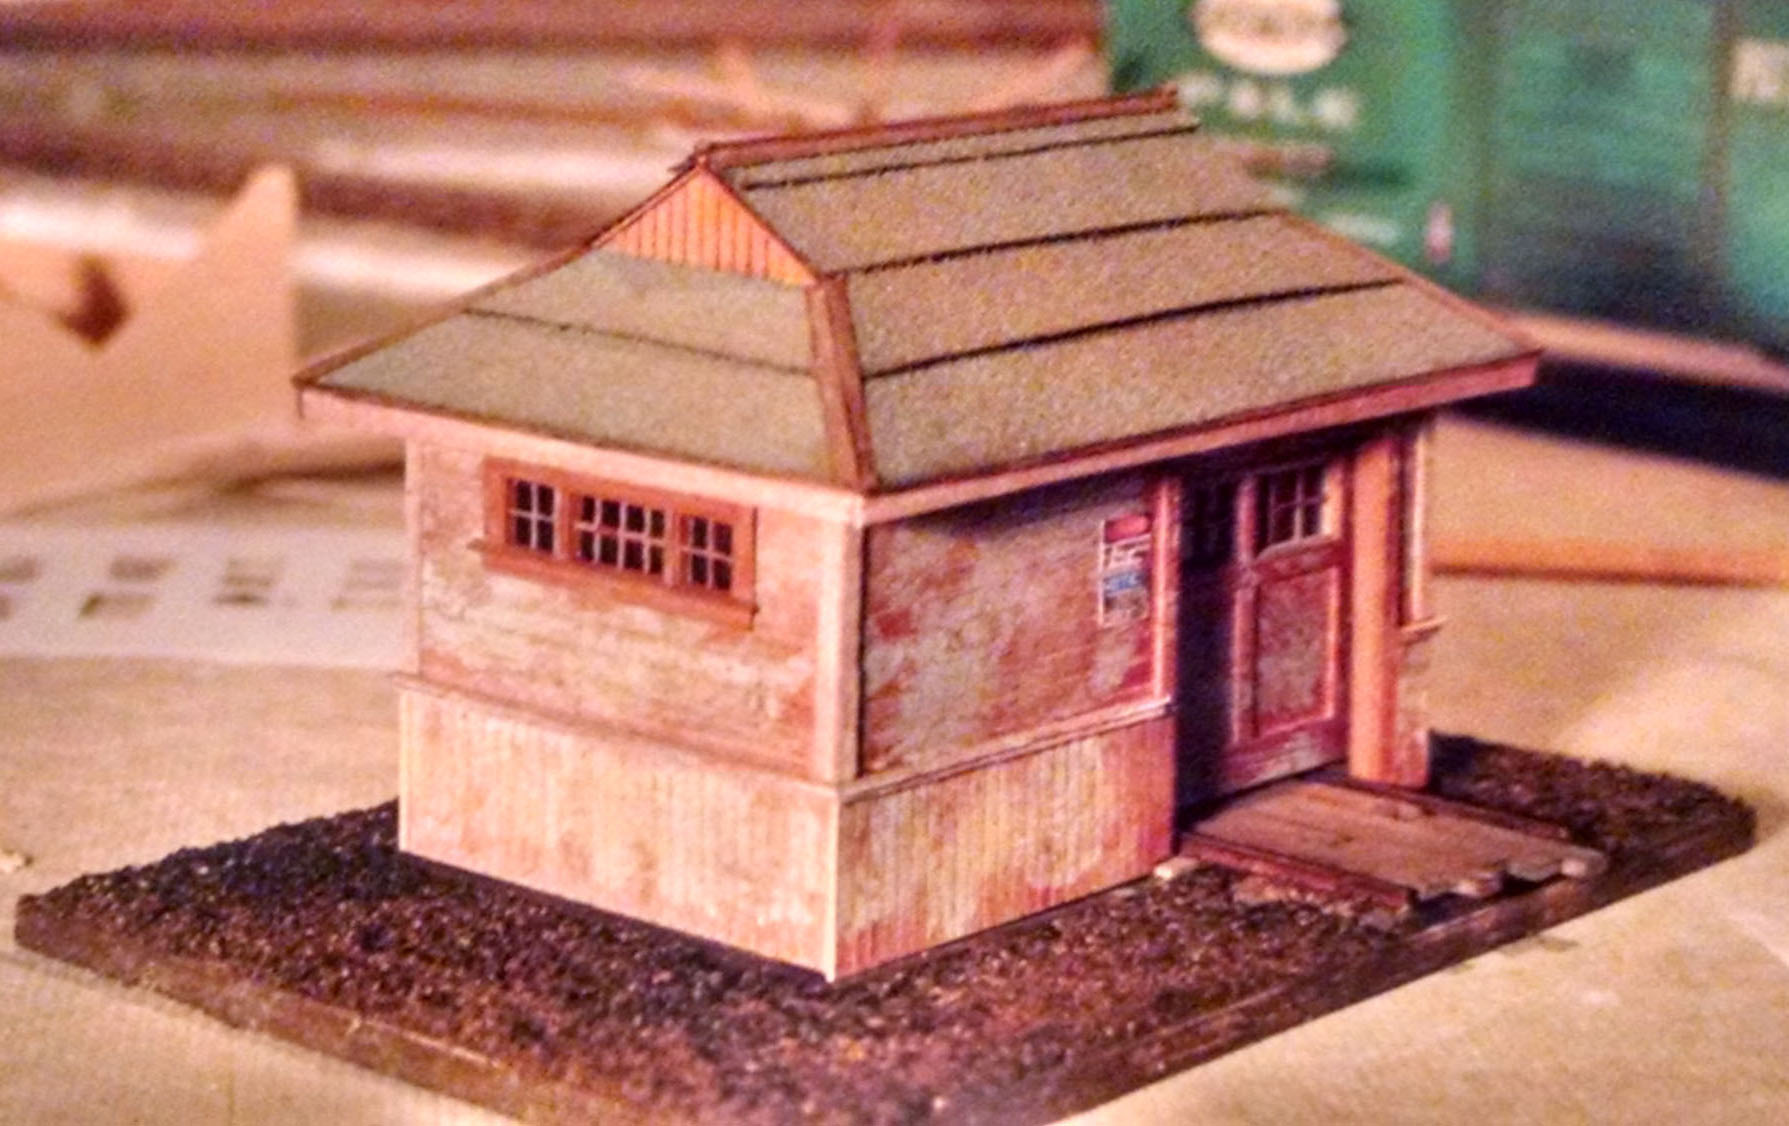 john-leow-handcar-shed-3.jpg